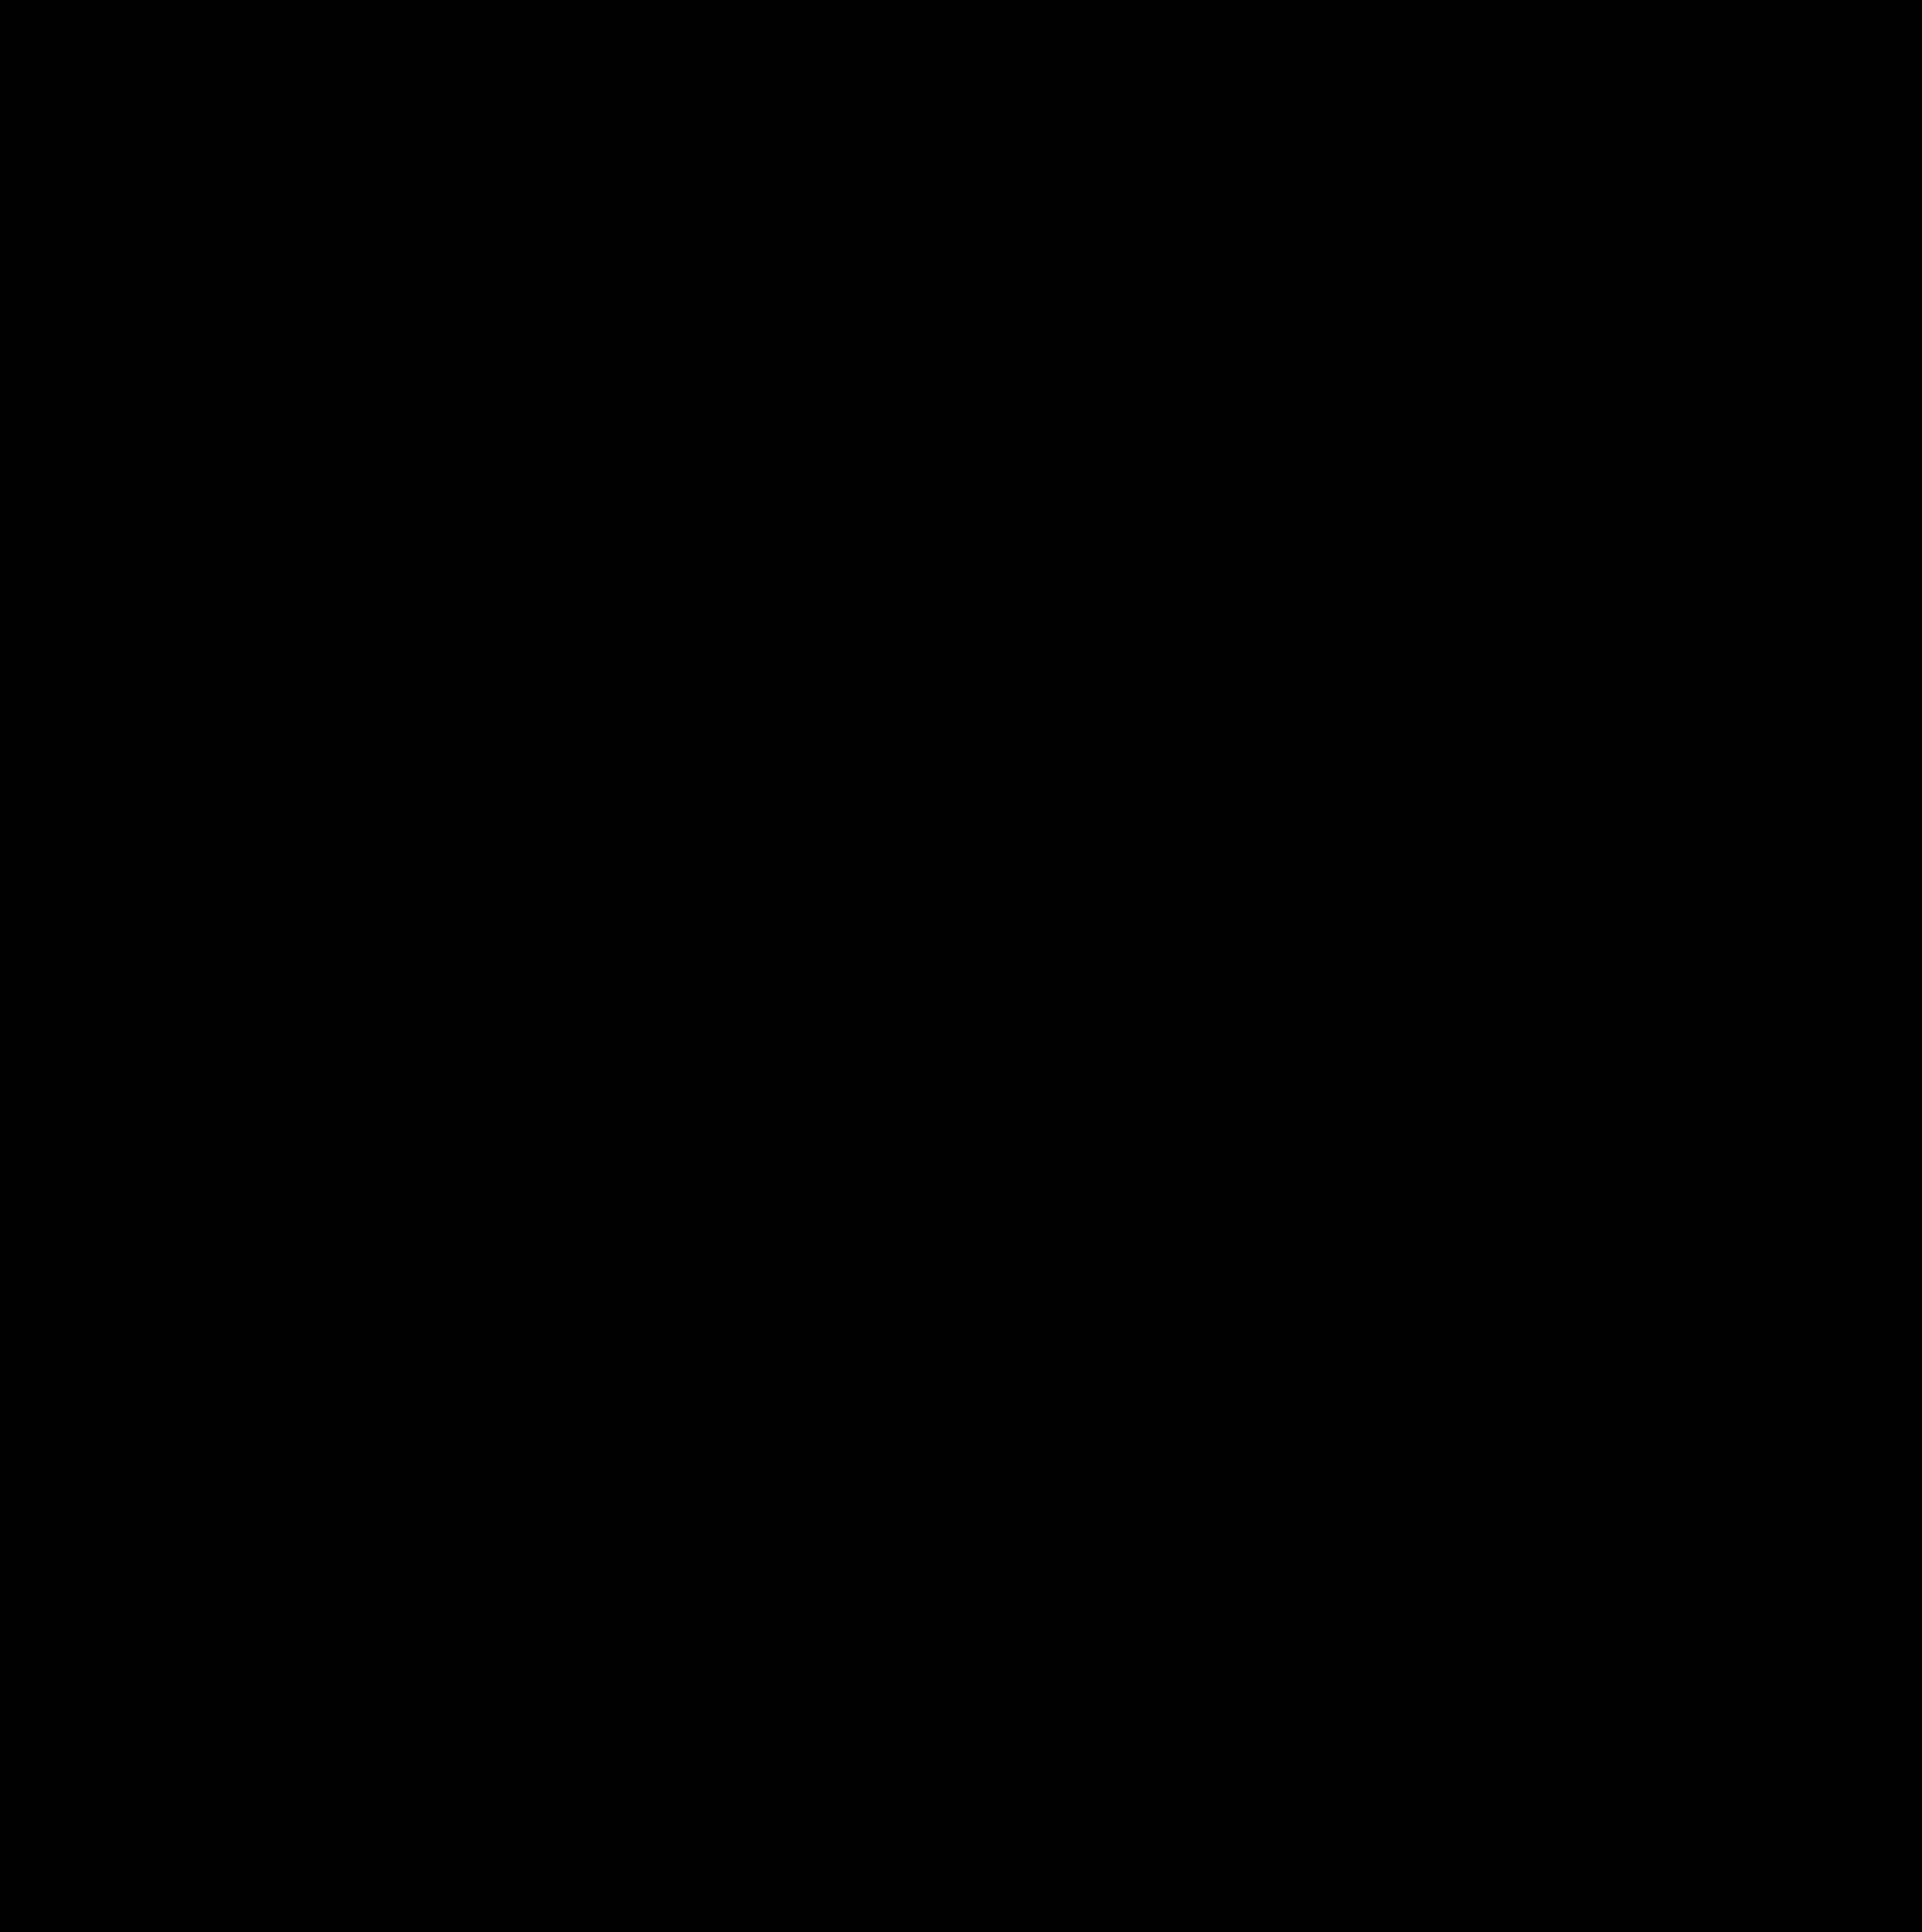 Spiral clipart simple Black Background Design Free on